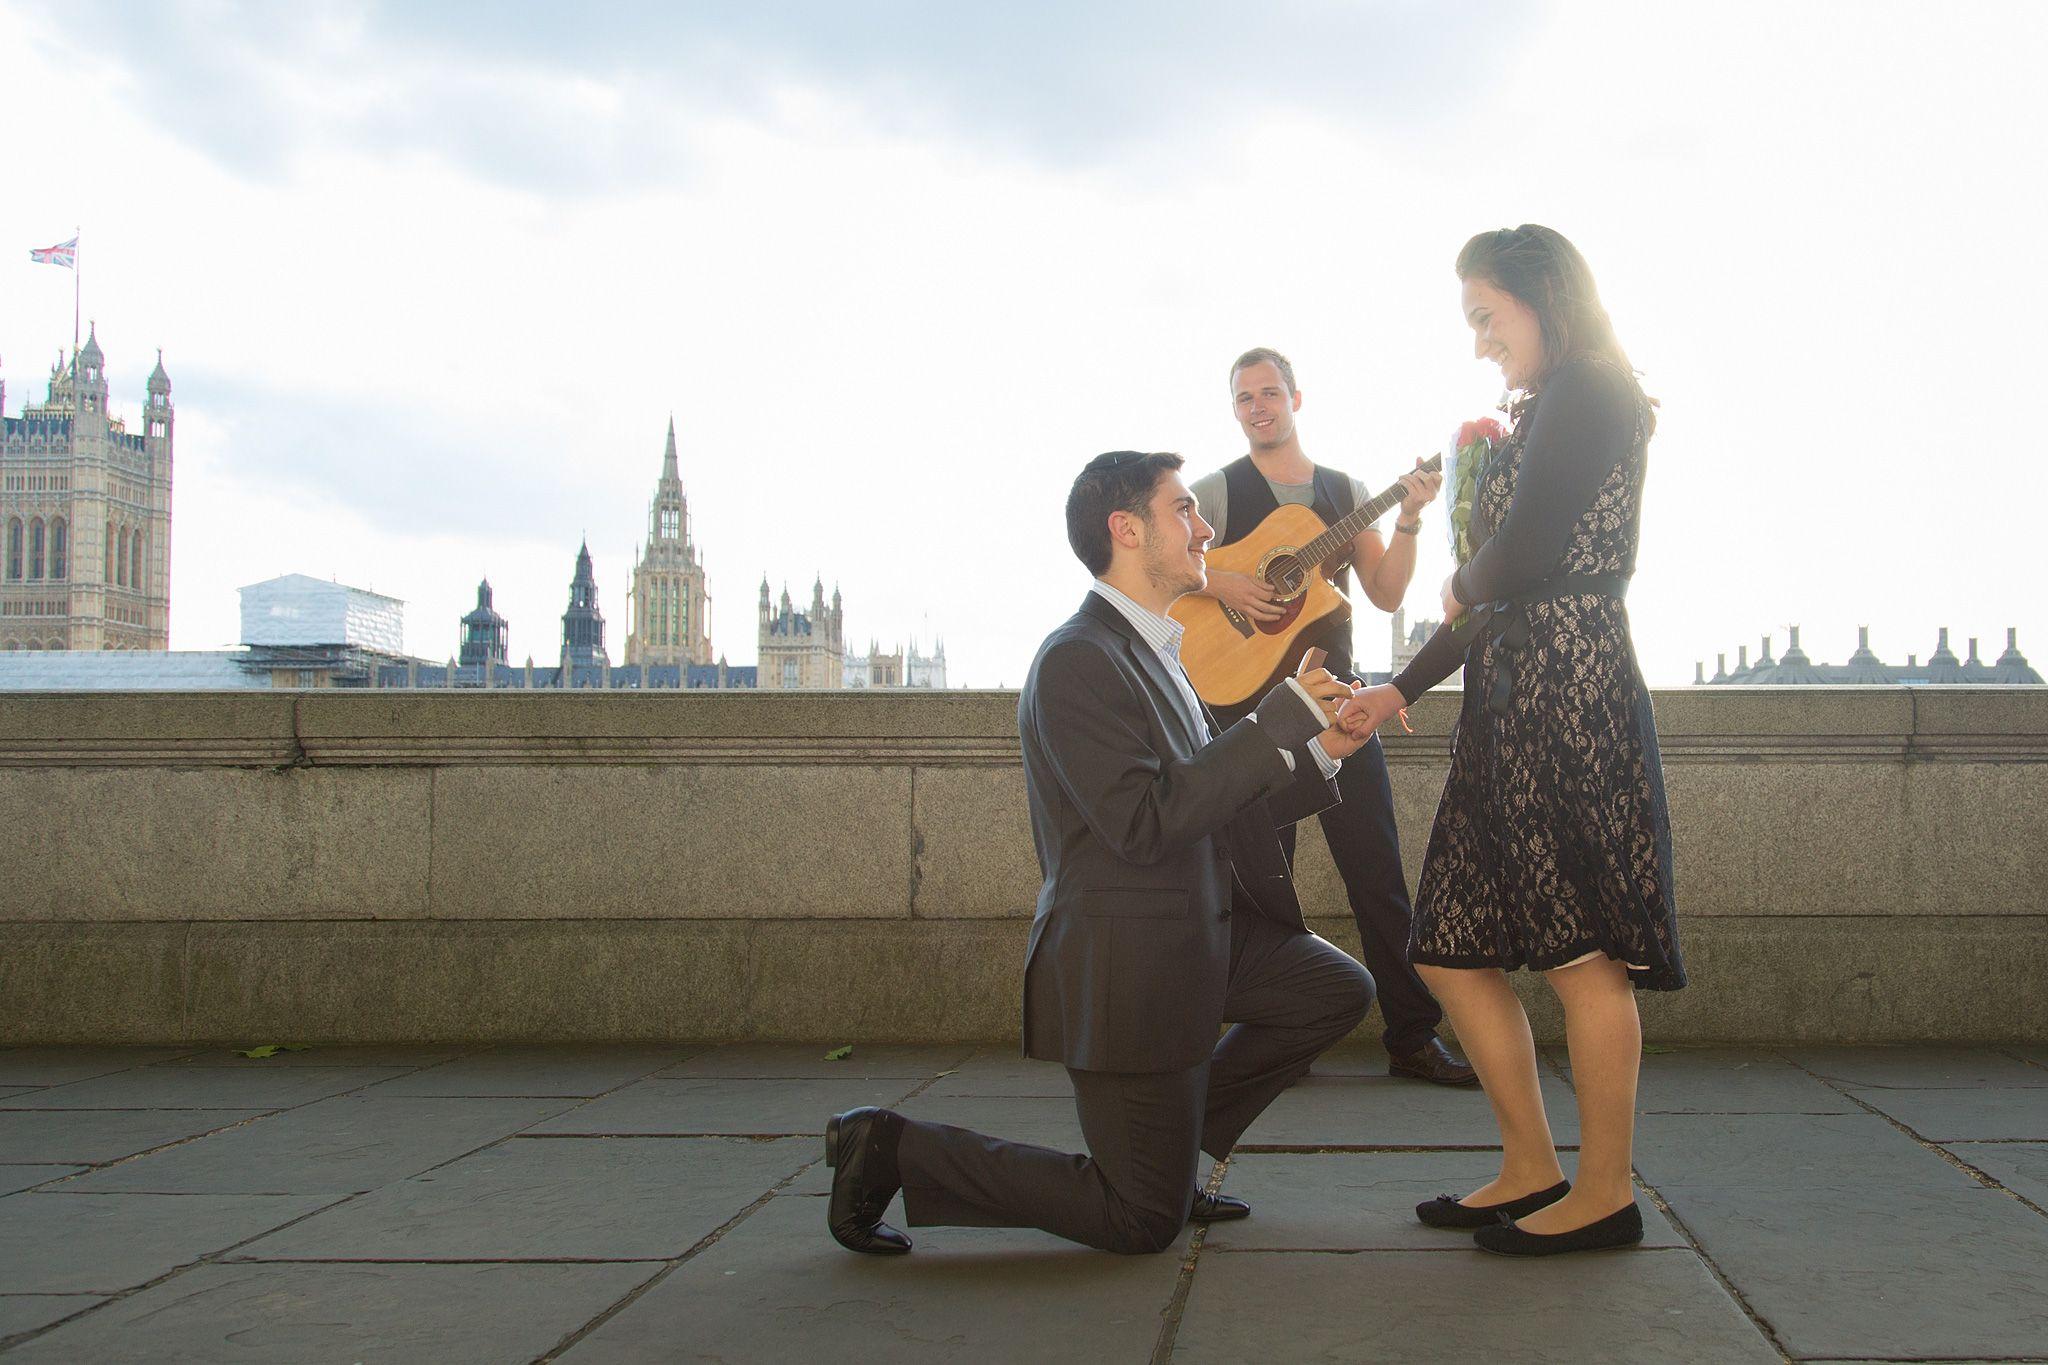 Surprise proposal in London